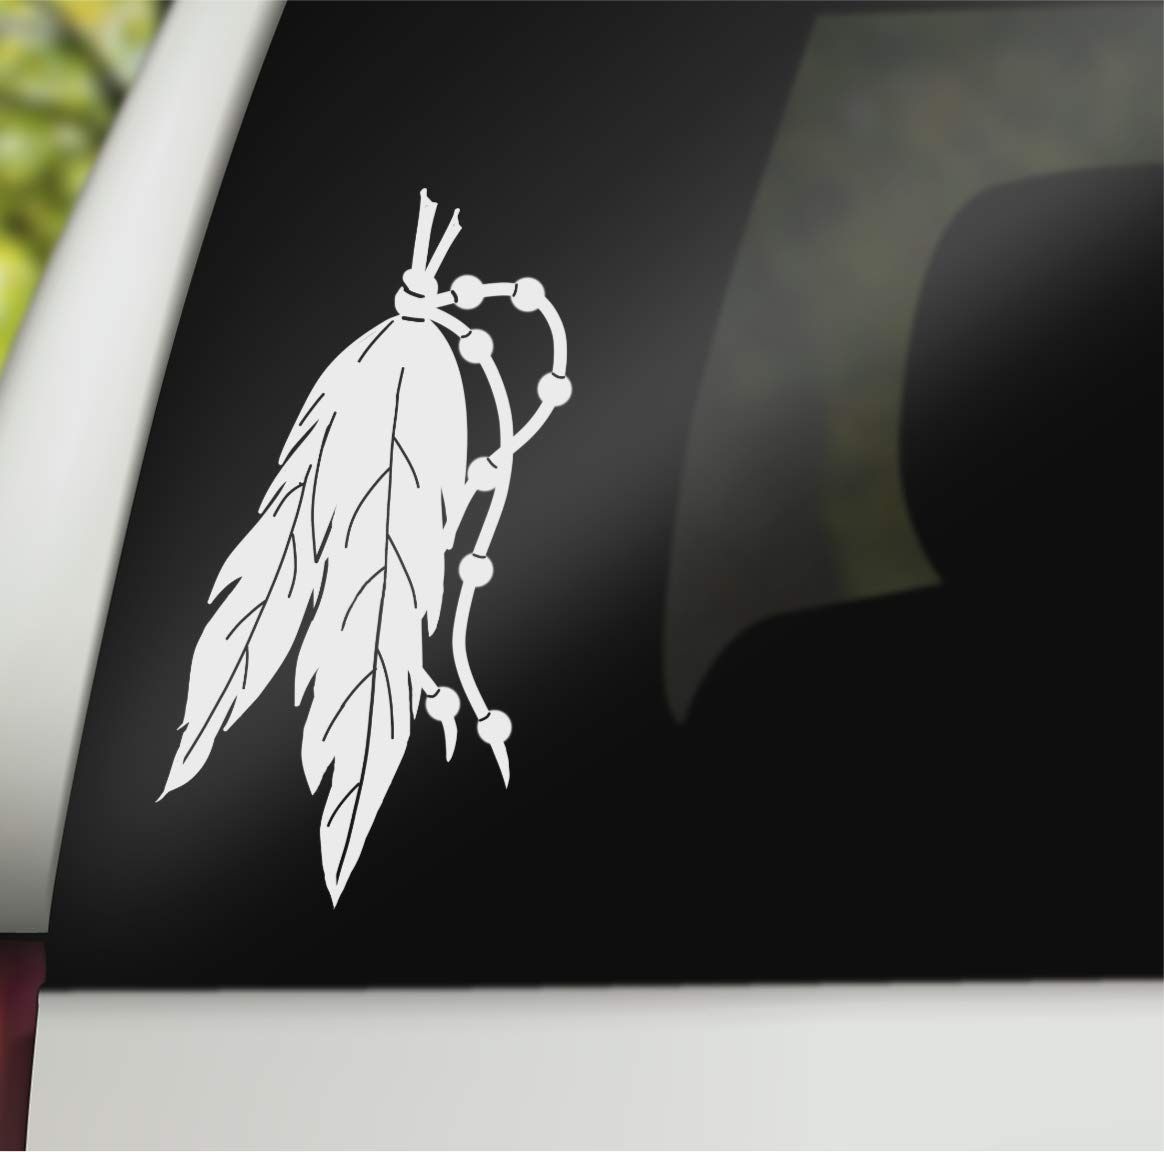 Walls Trucks 11.5 White Laptops SmartKastic Car Tats NATIVE FEATHERS Vinyl Decal Window Sticker for Cars Windows